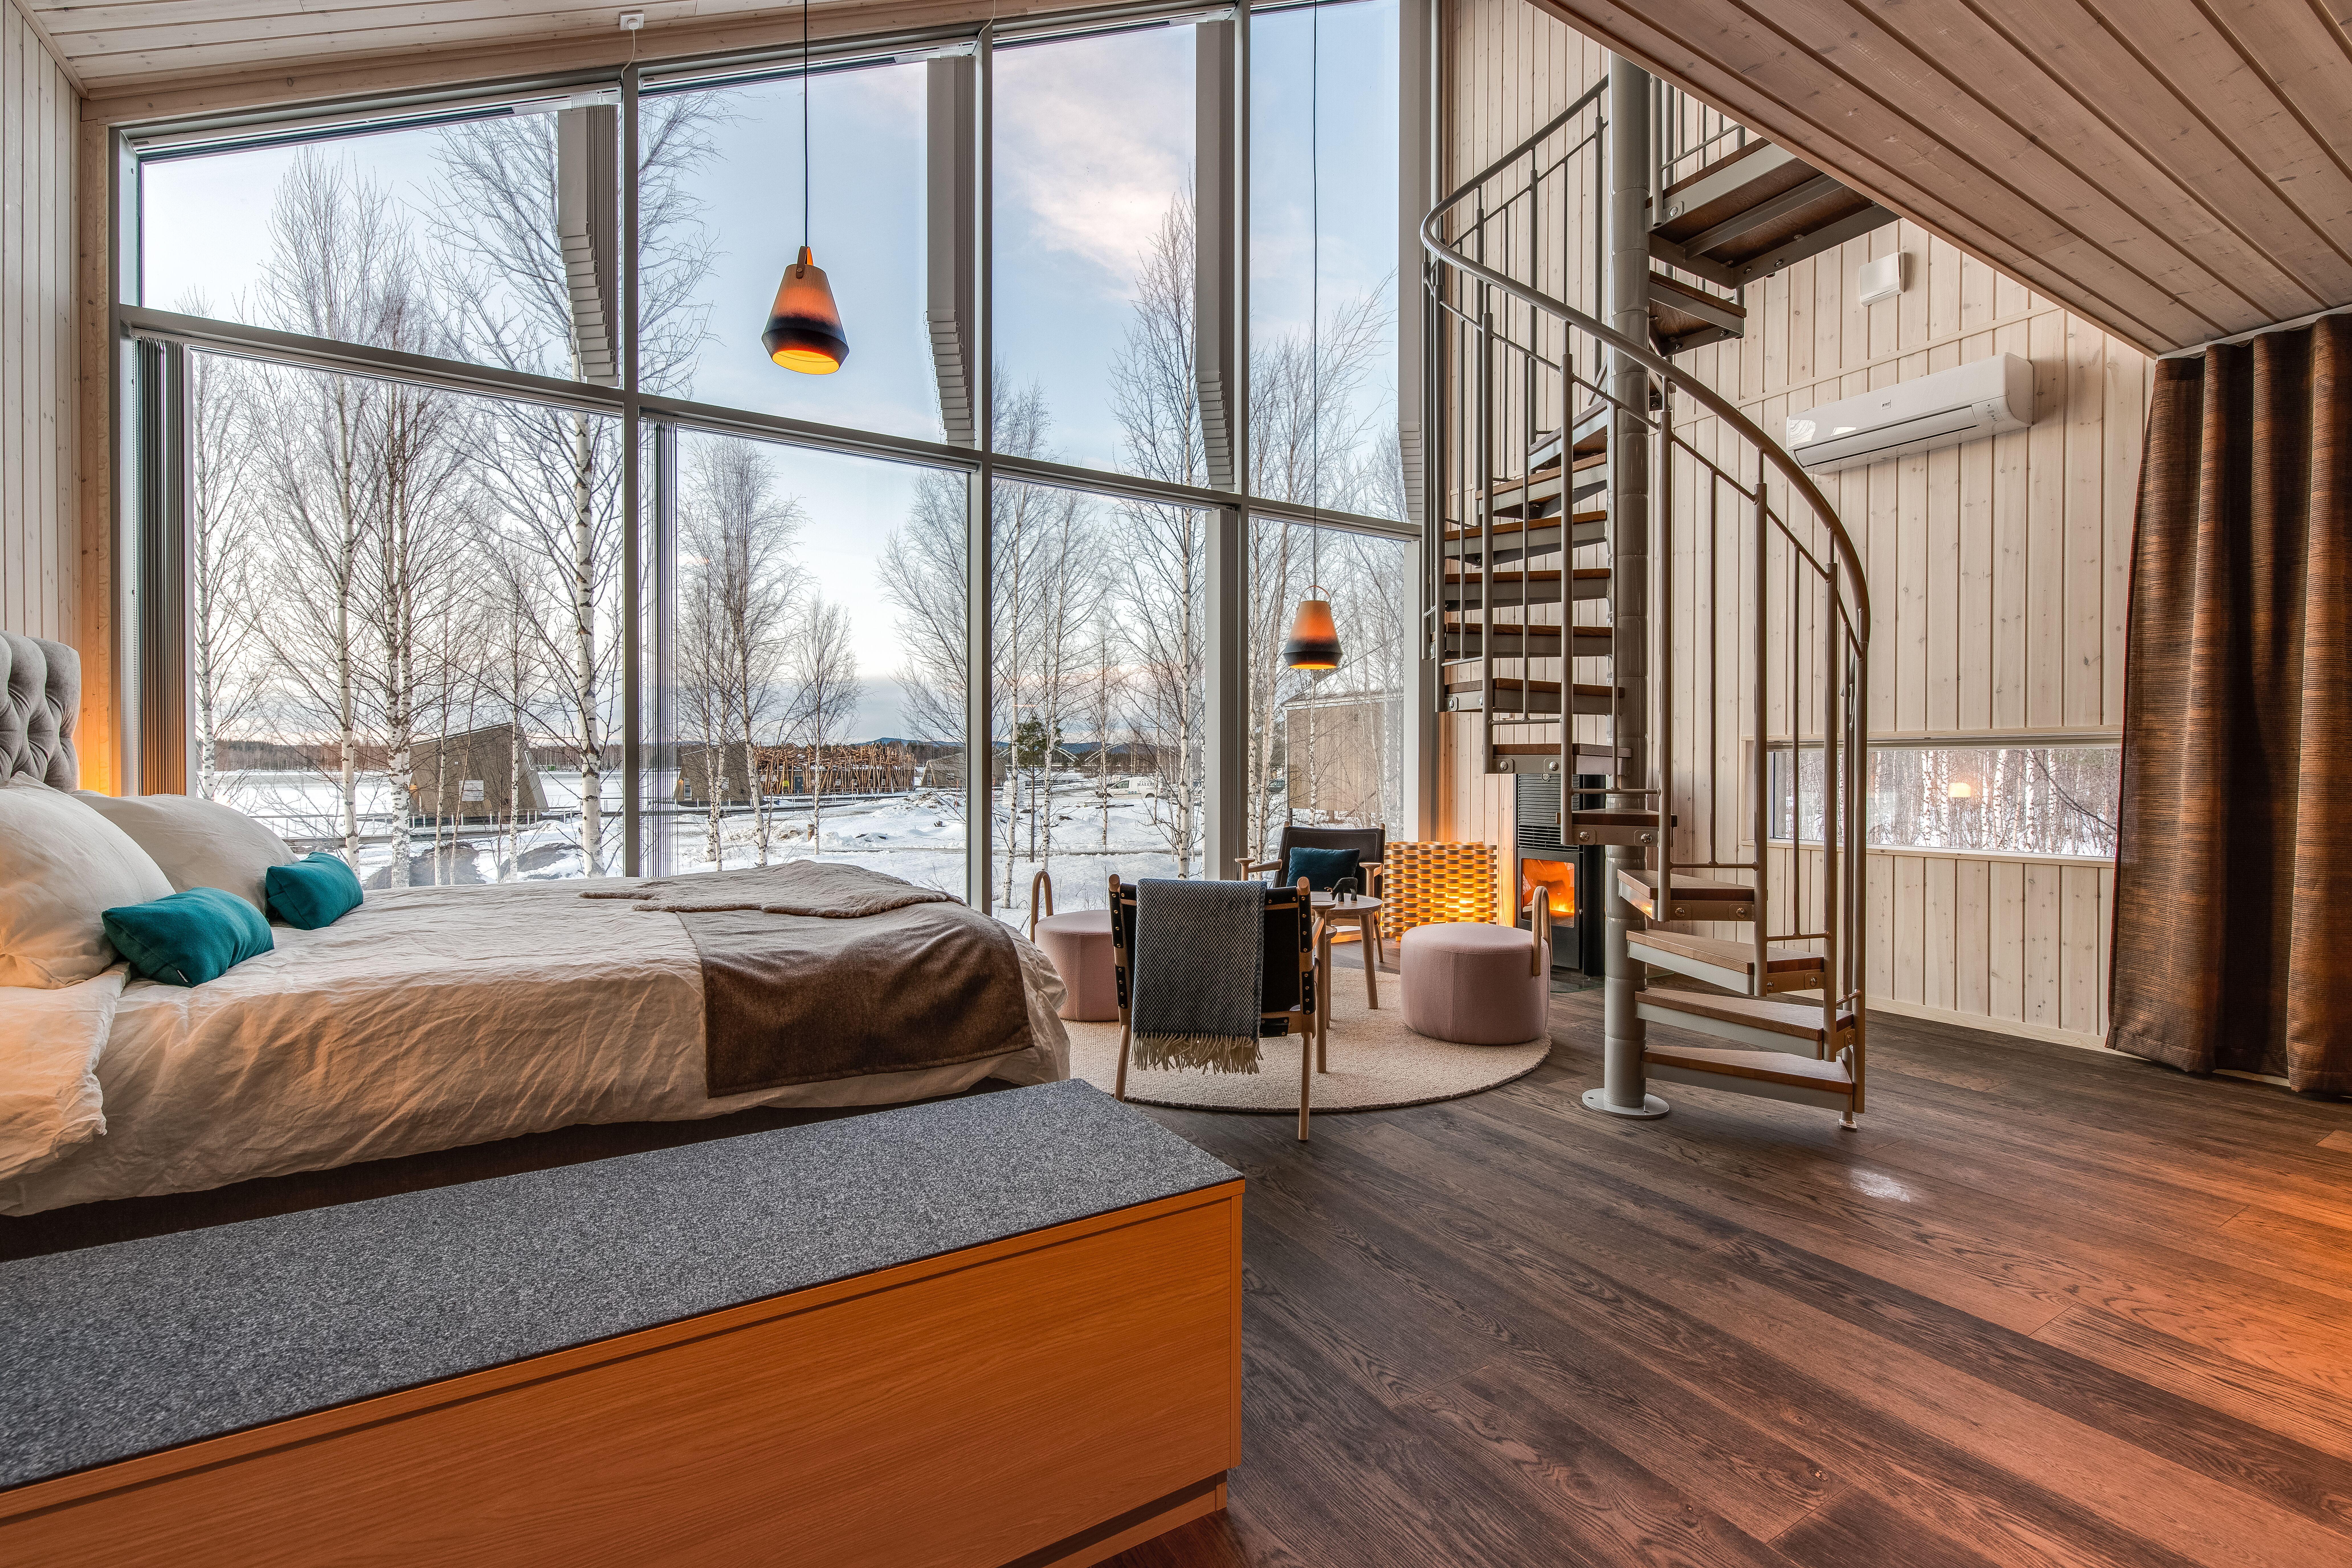 Land Cabin Suite at the Arctic Bath Sweden